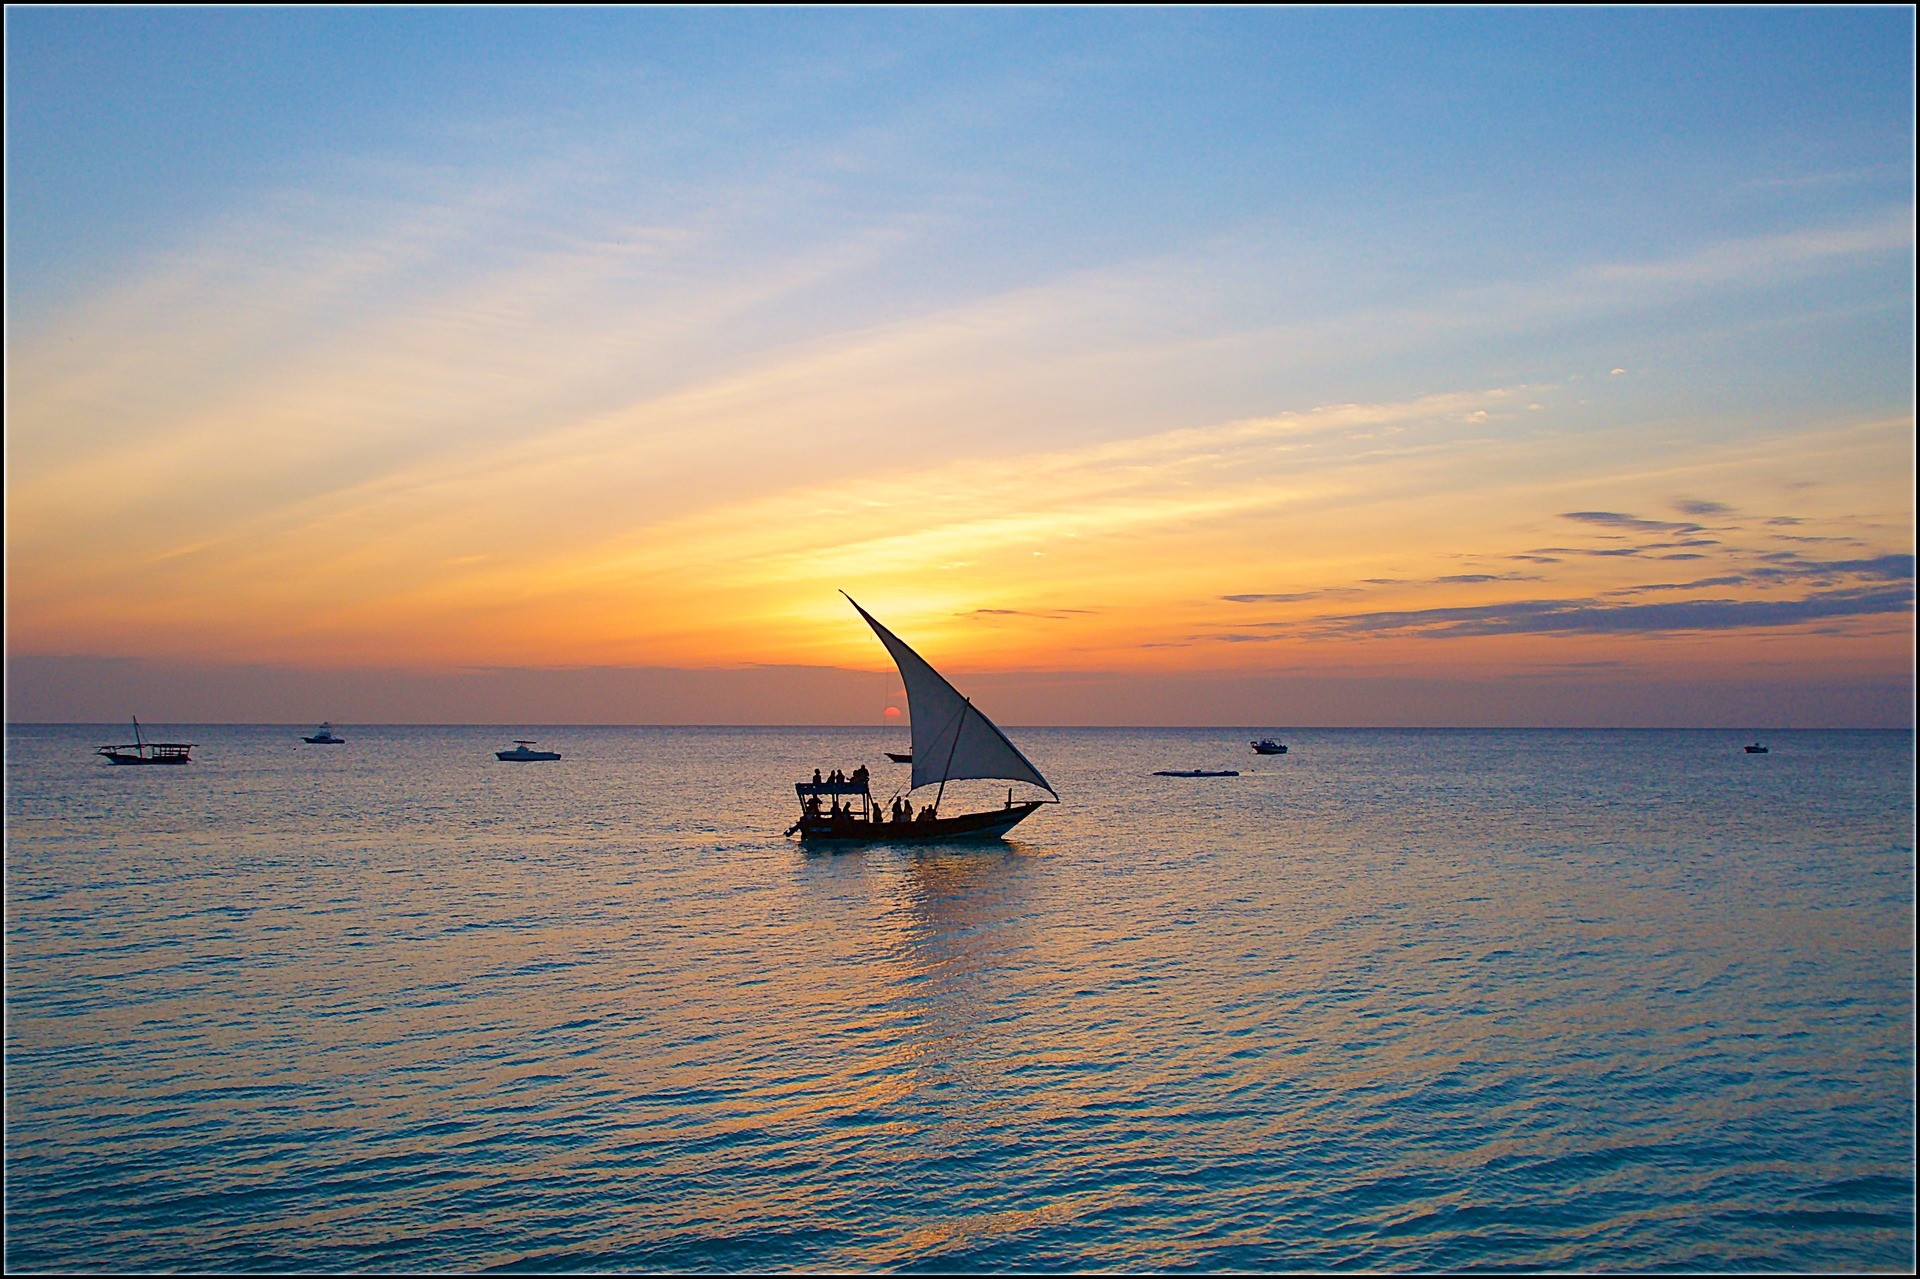 Visserbootjes, Zanzibar, Tanzania